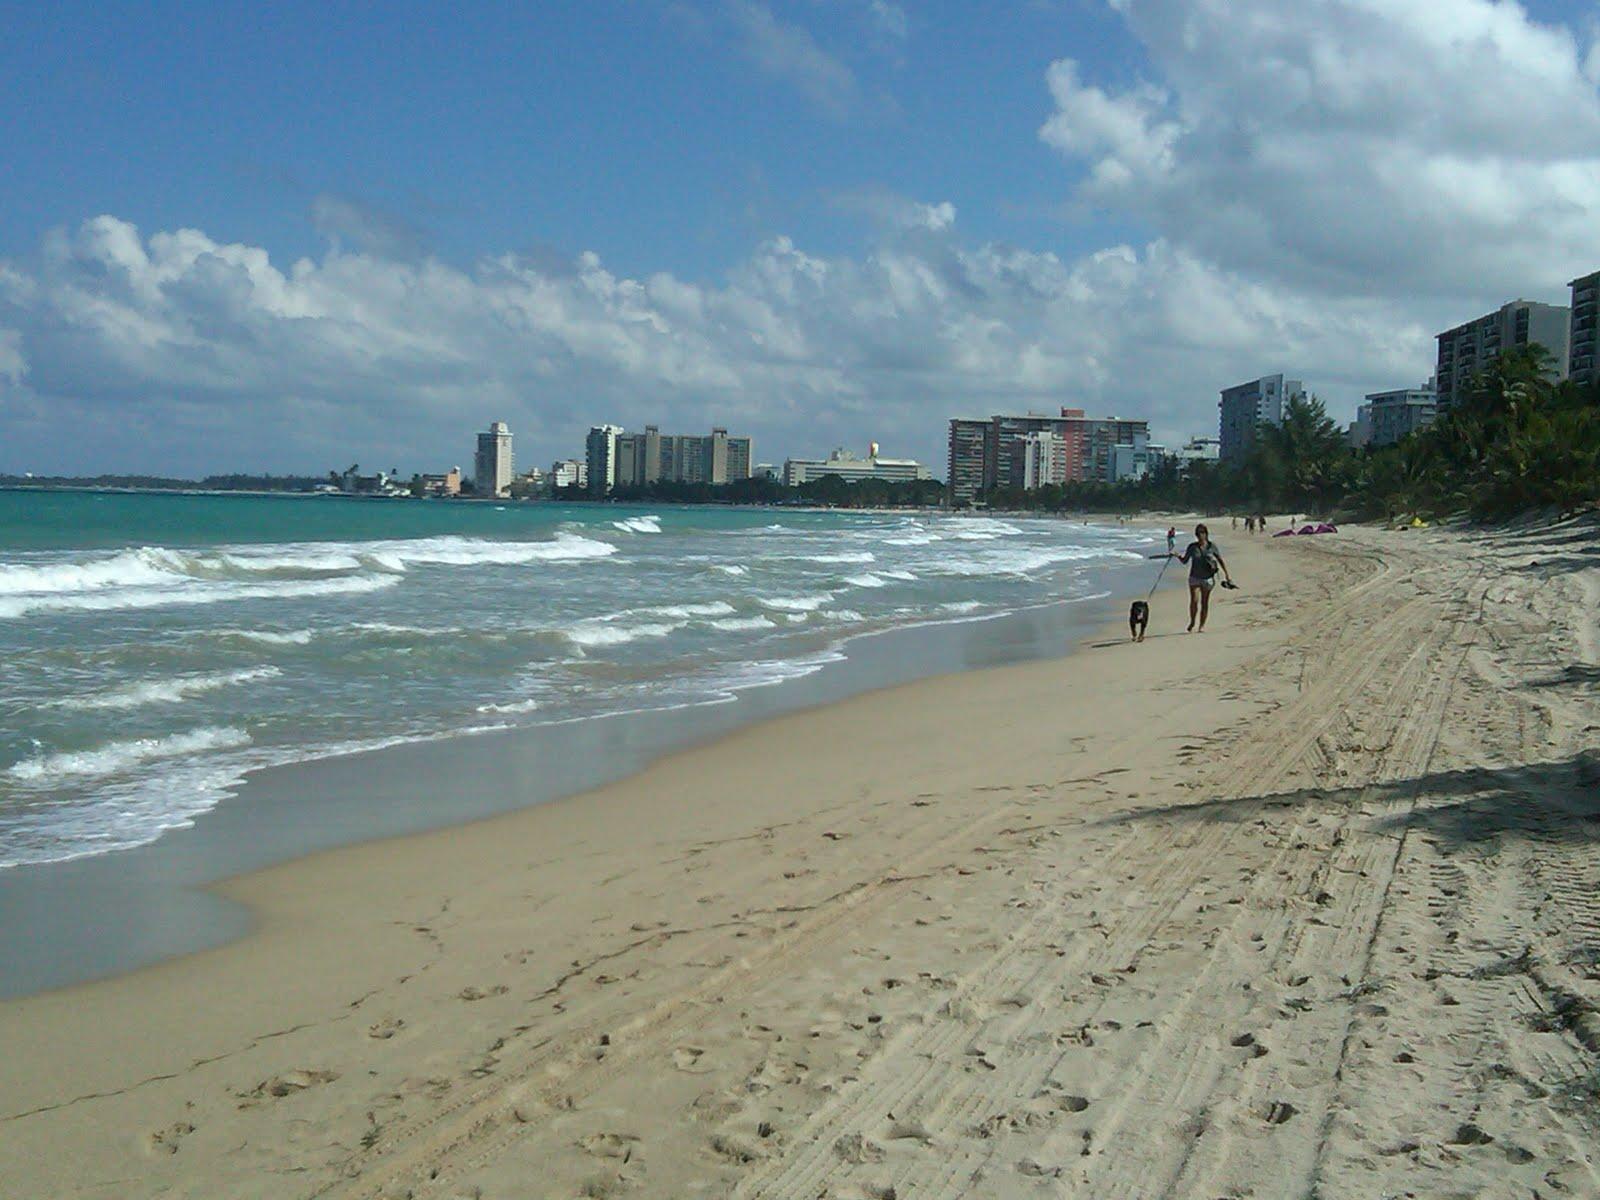 Hotel Metropolitan Playa Entfernung Zum Strand